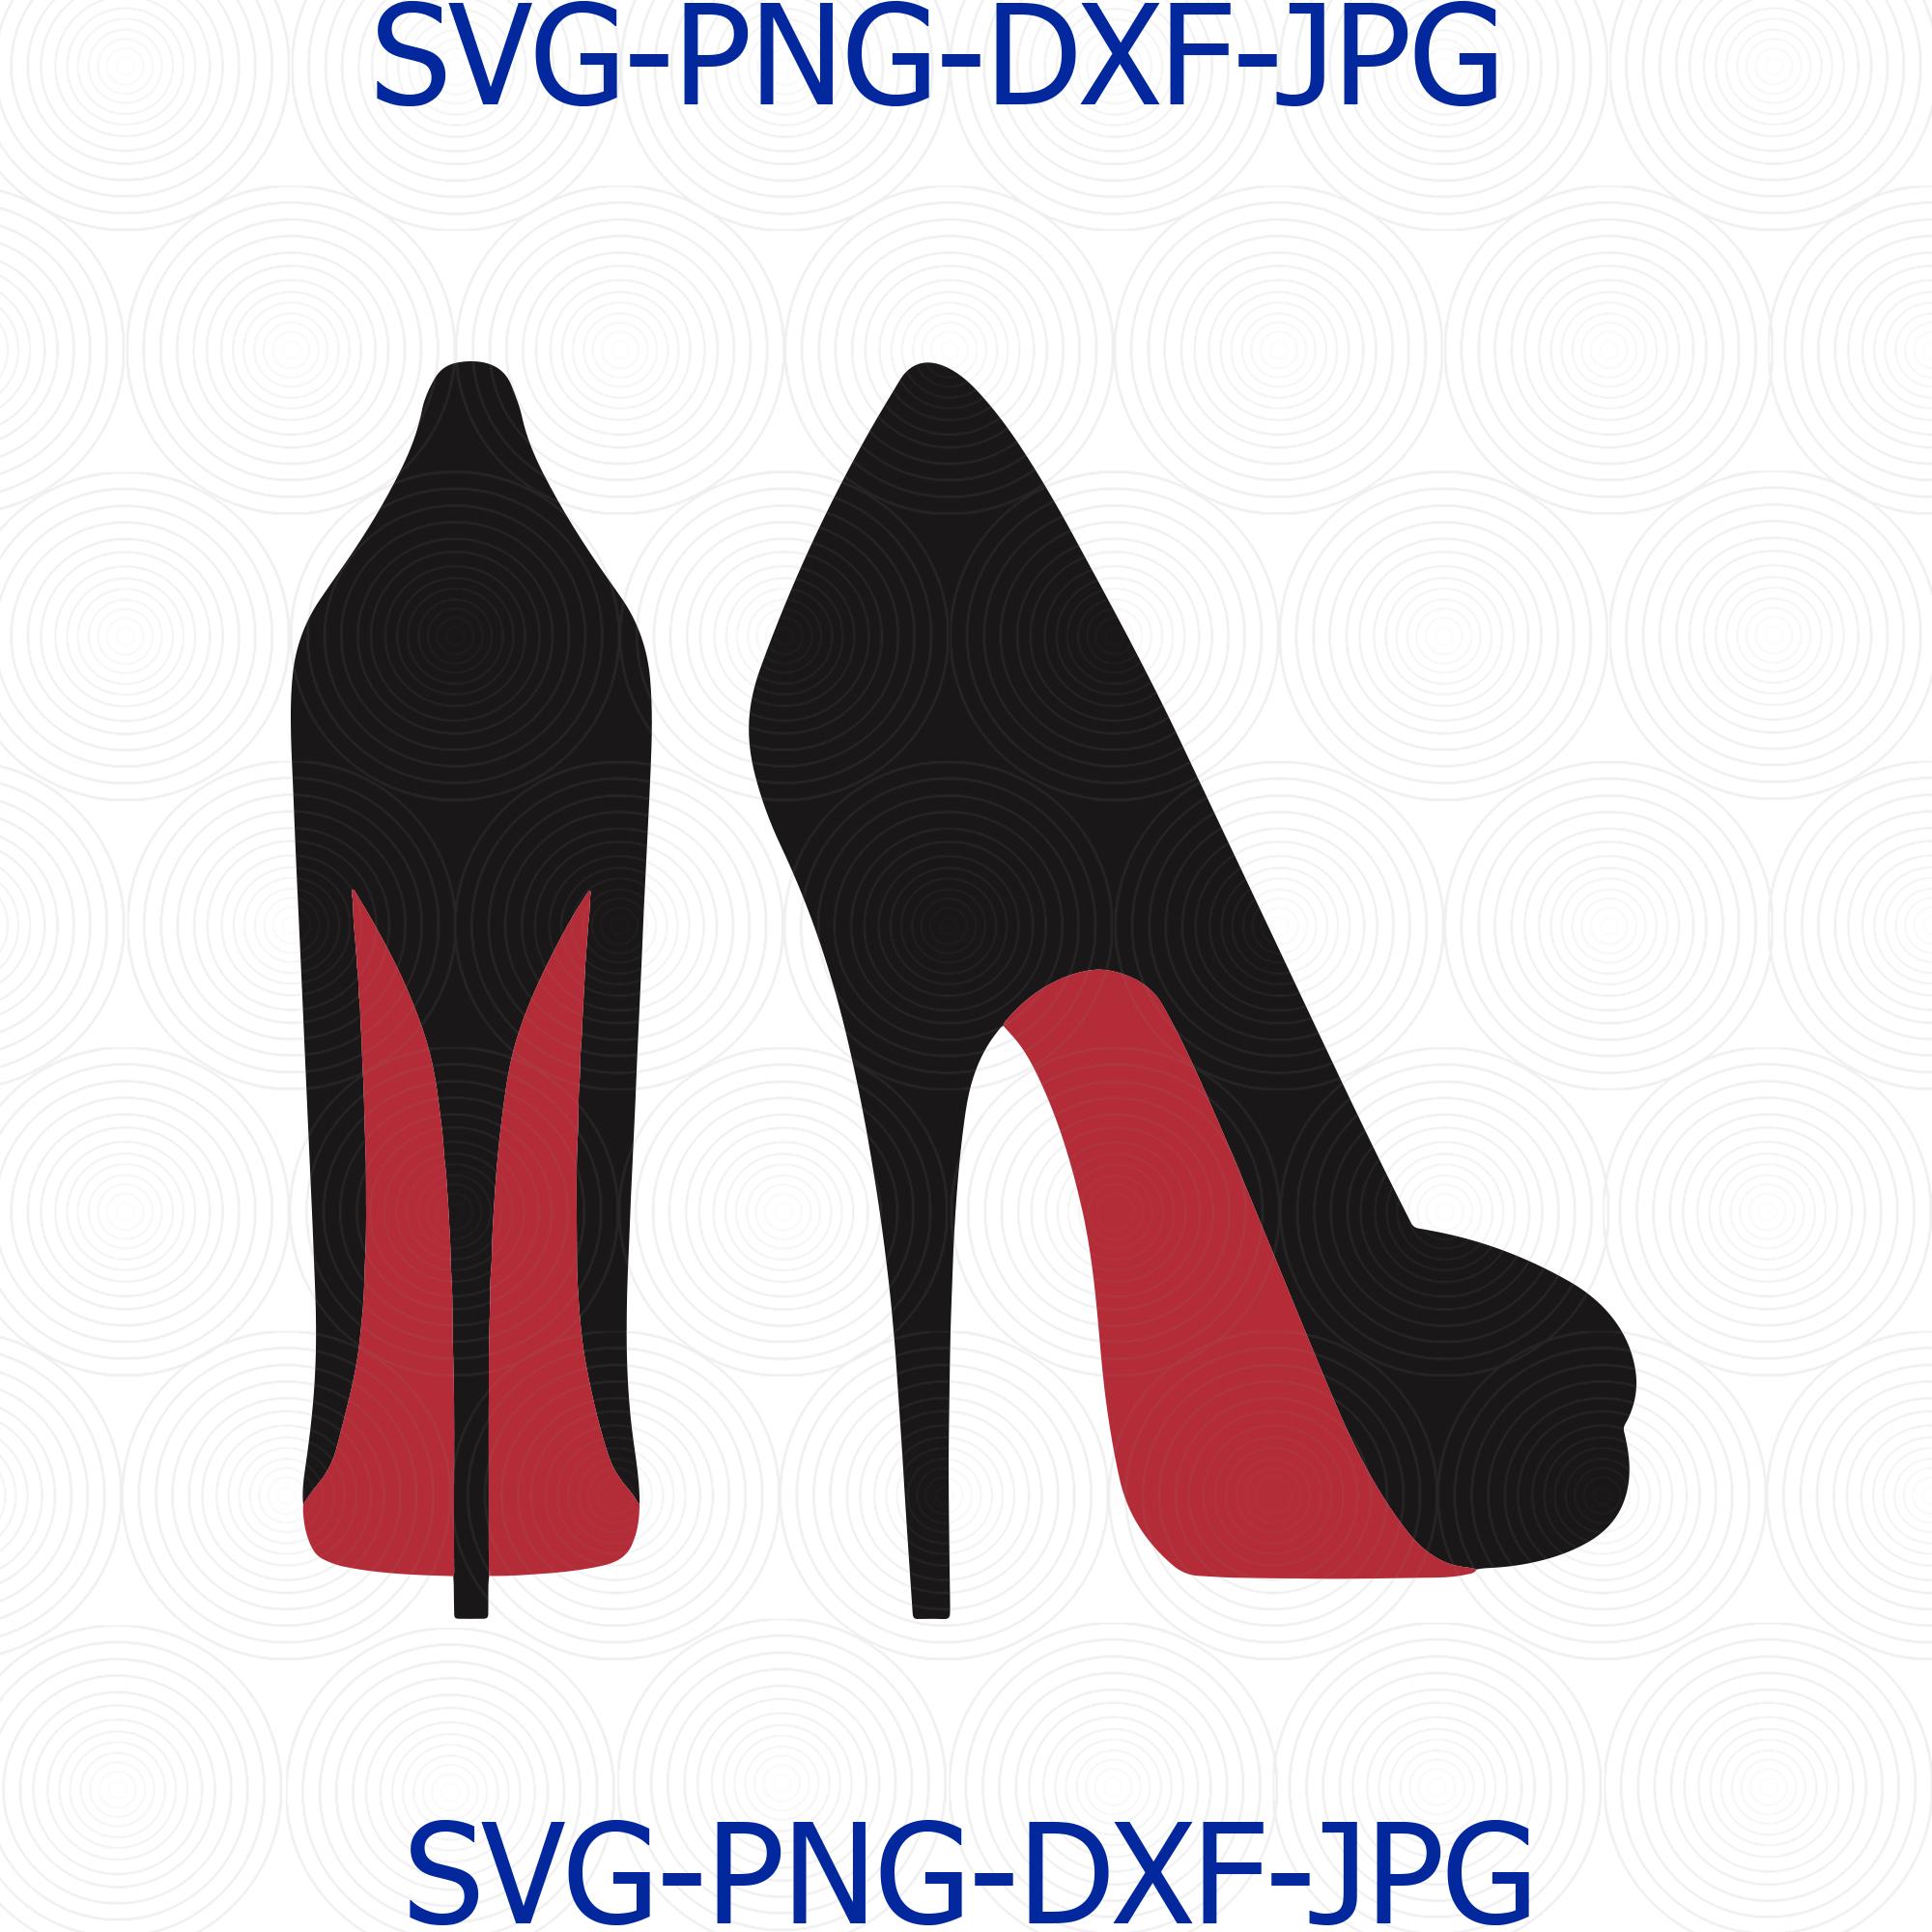 Svg High Heels Dxf Png High Heels Beauty By Digital4u On Zibbet